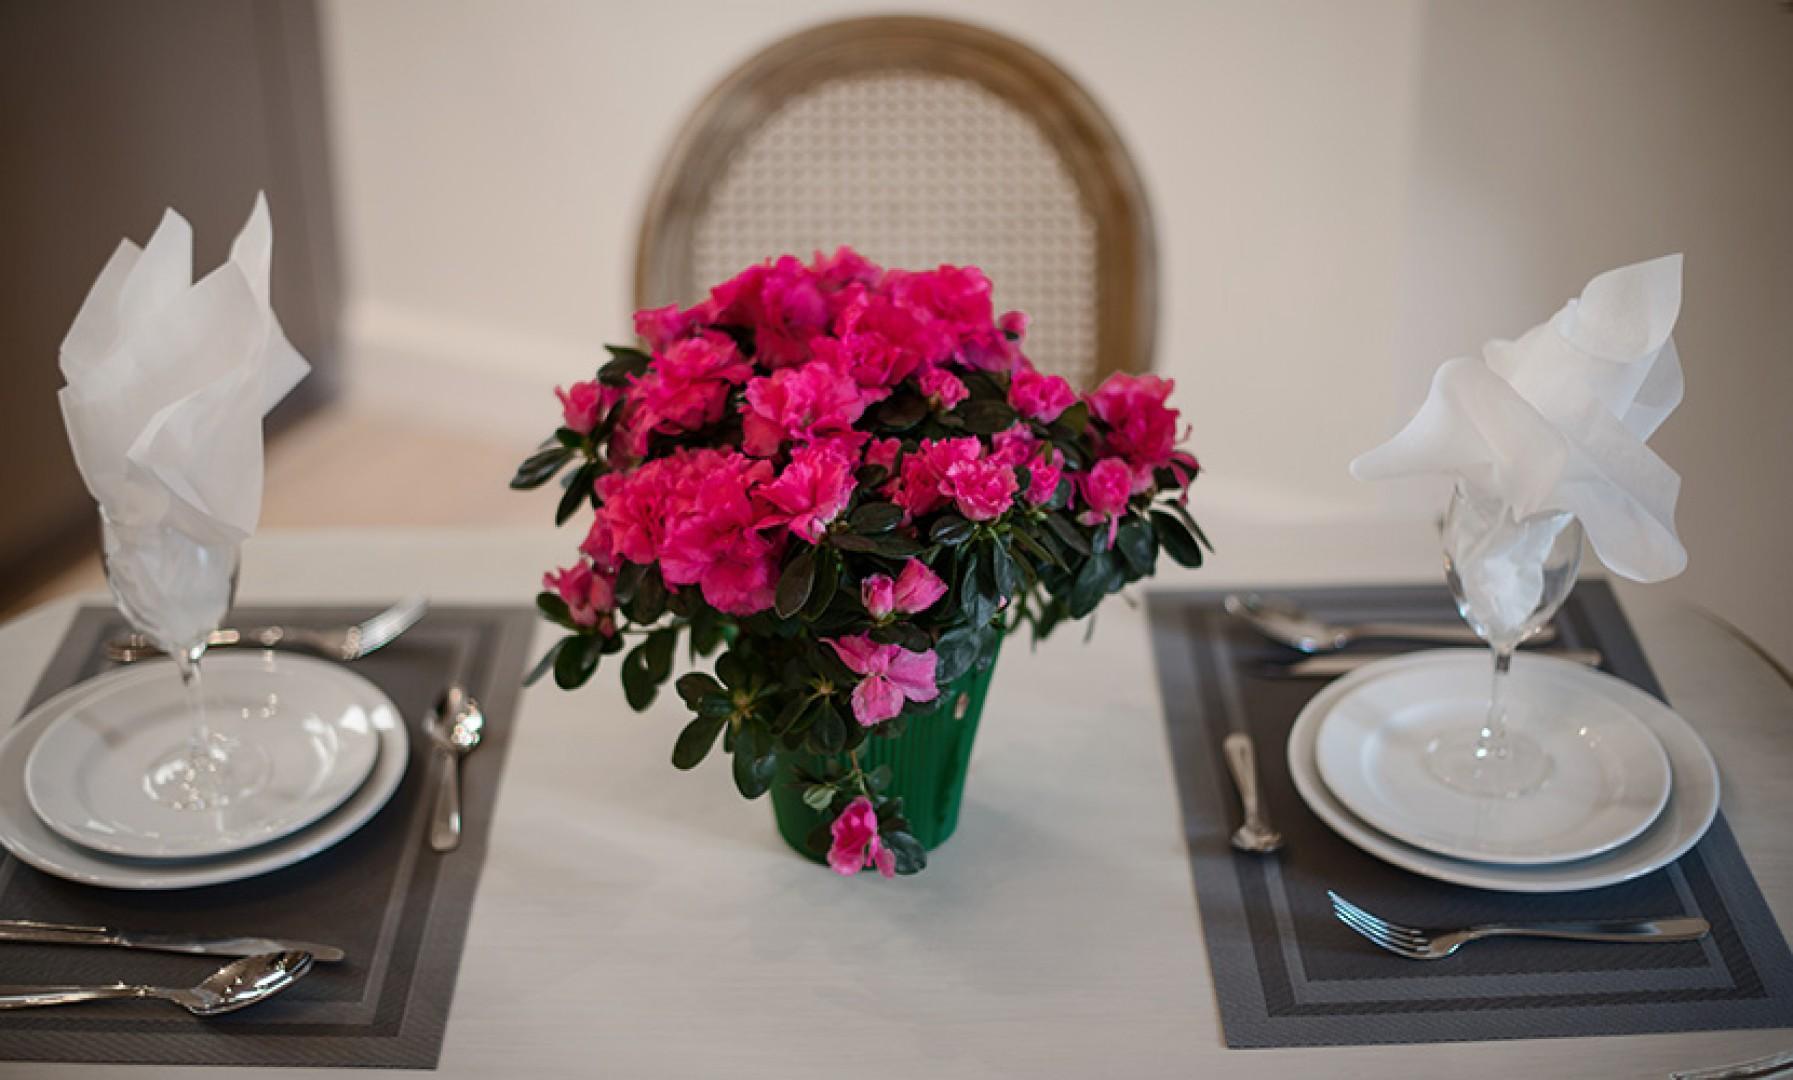 A romantic dinner setting in Paris - your apartment!